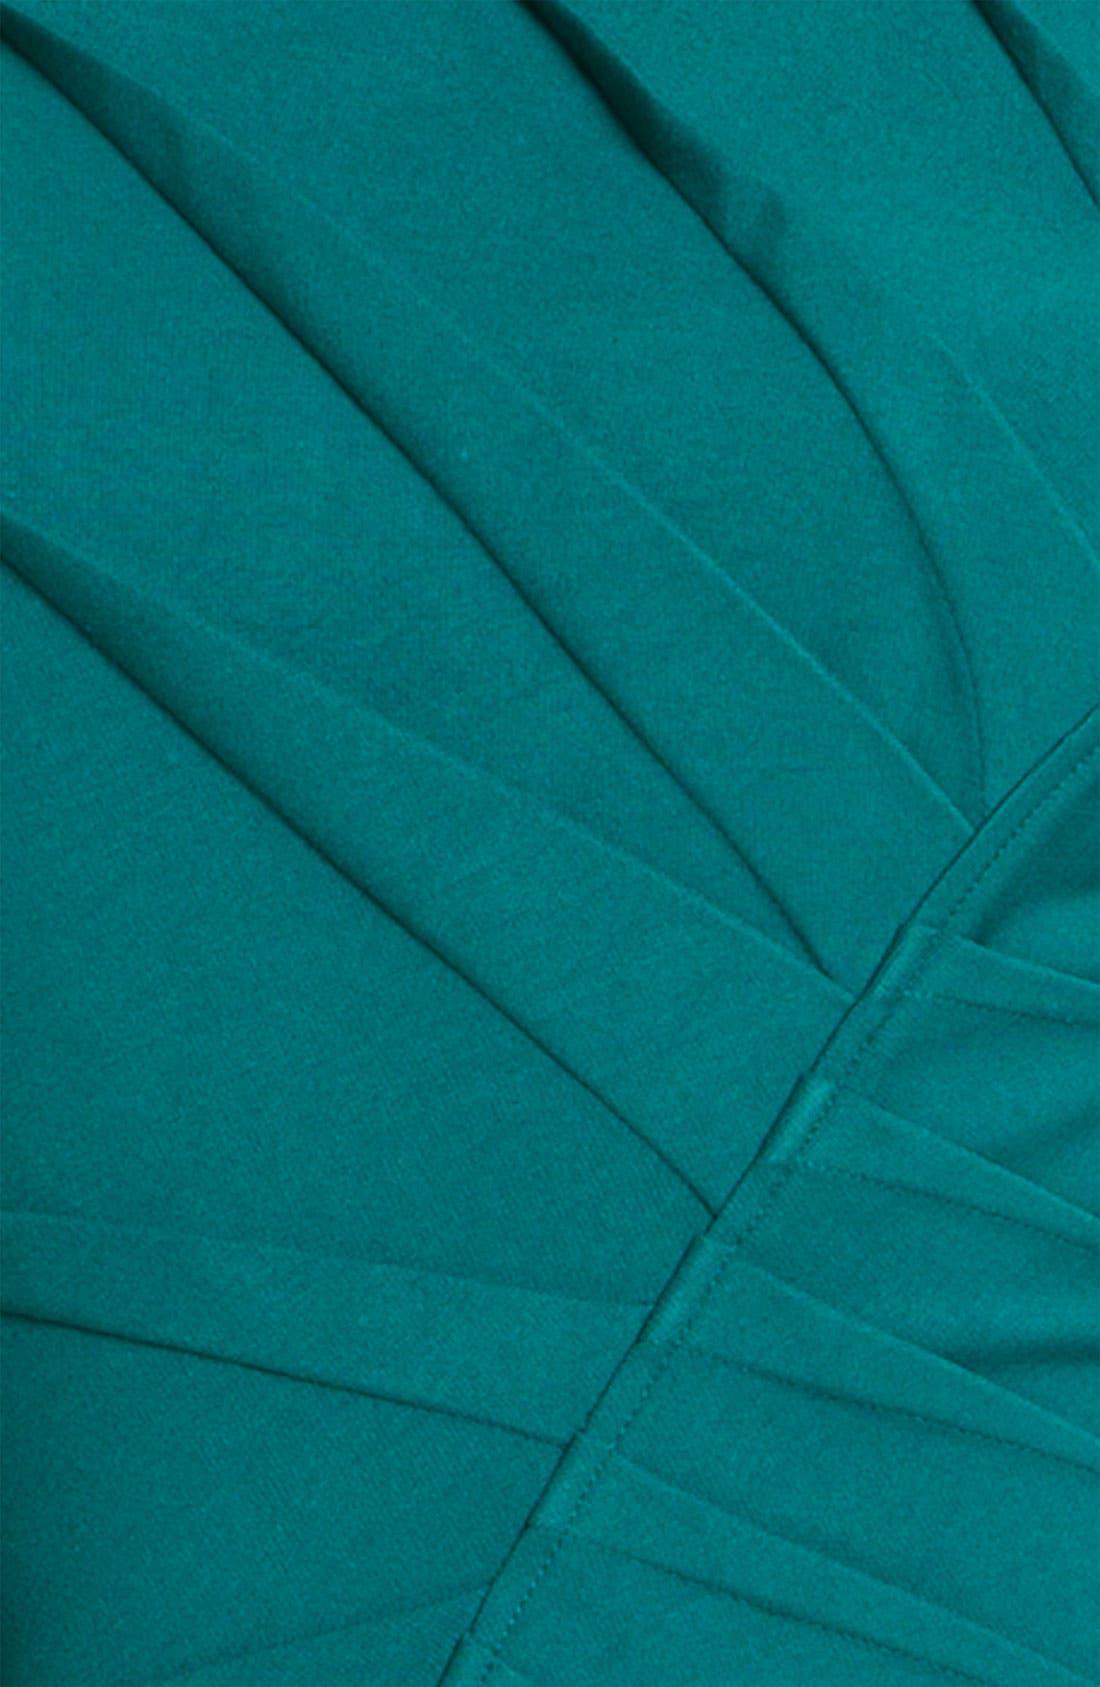 Alternate Image 3  - Adrianna Papell Inverted Pleat Ponte Sheath Dress (Petite)